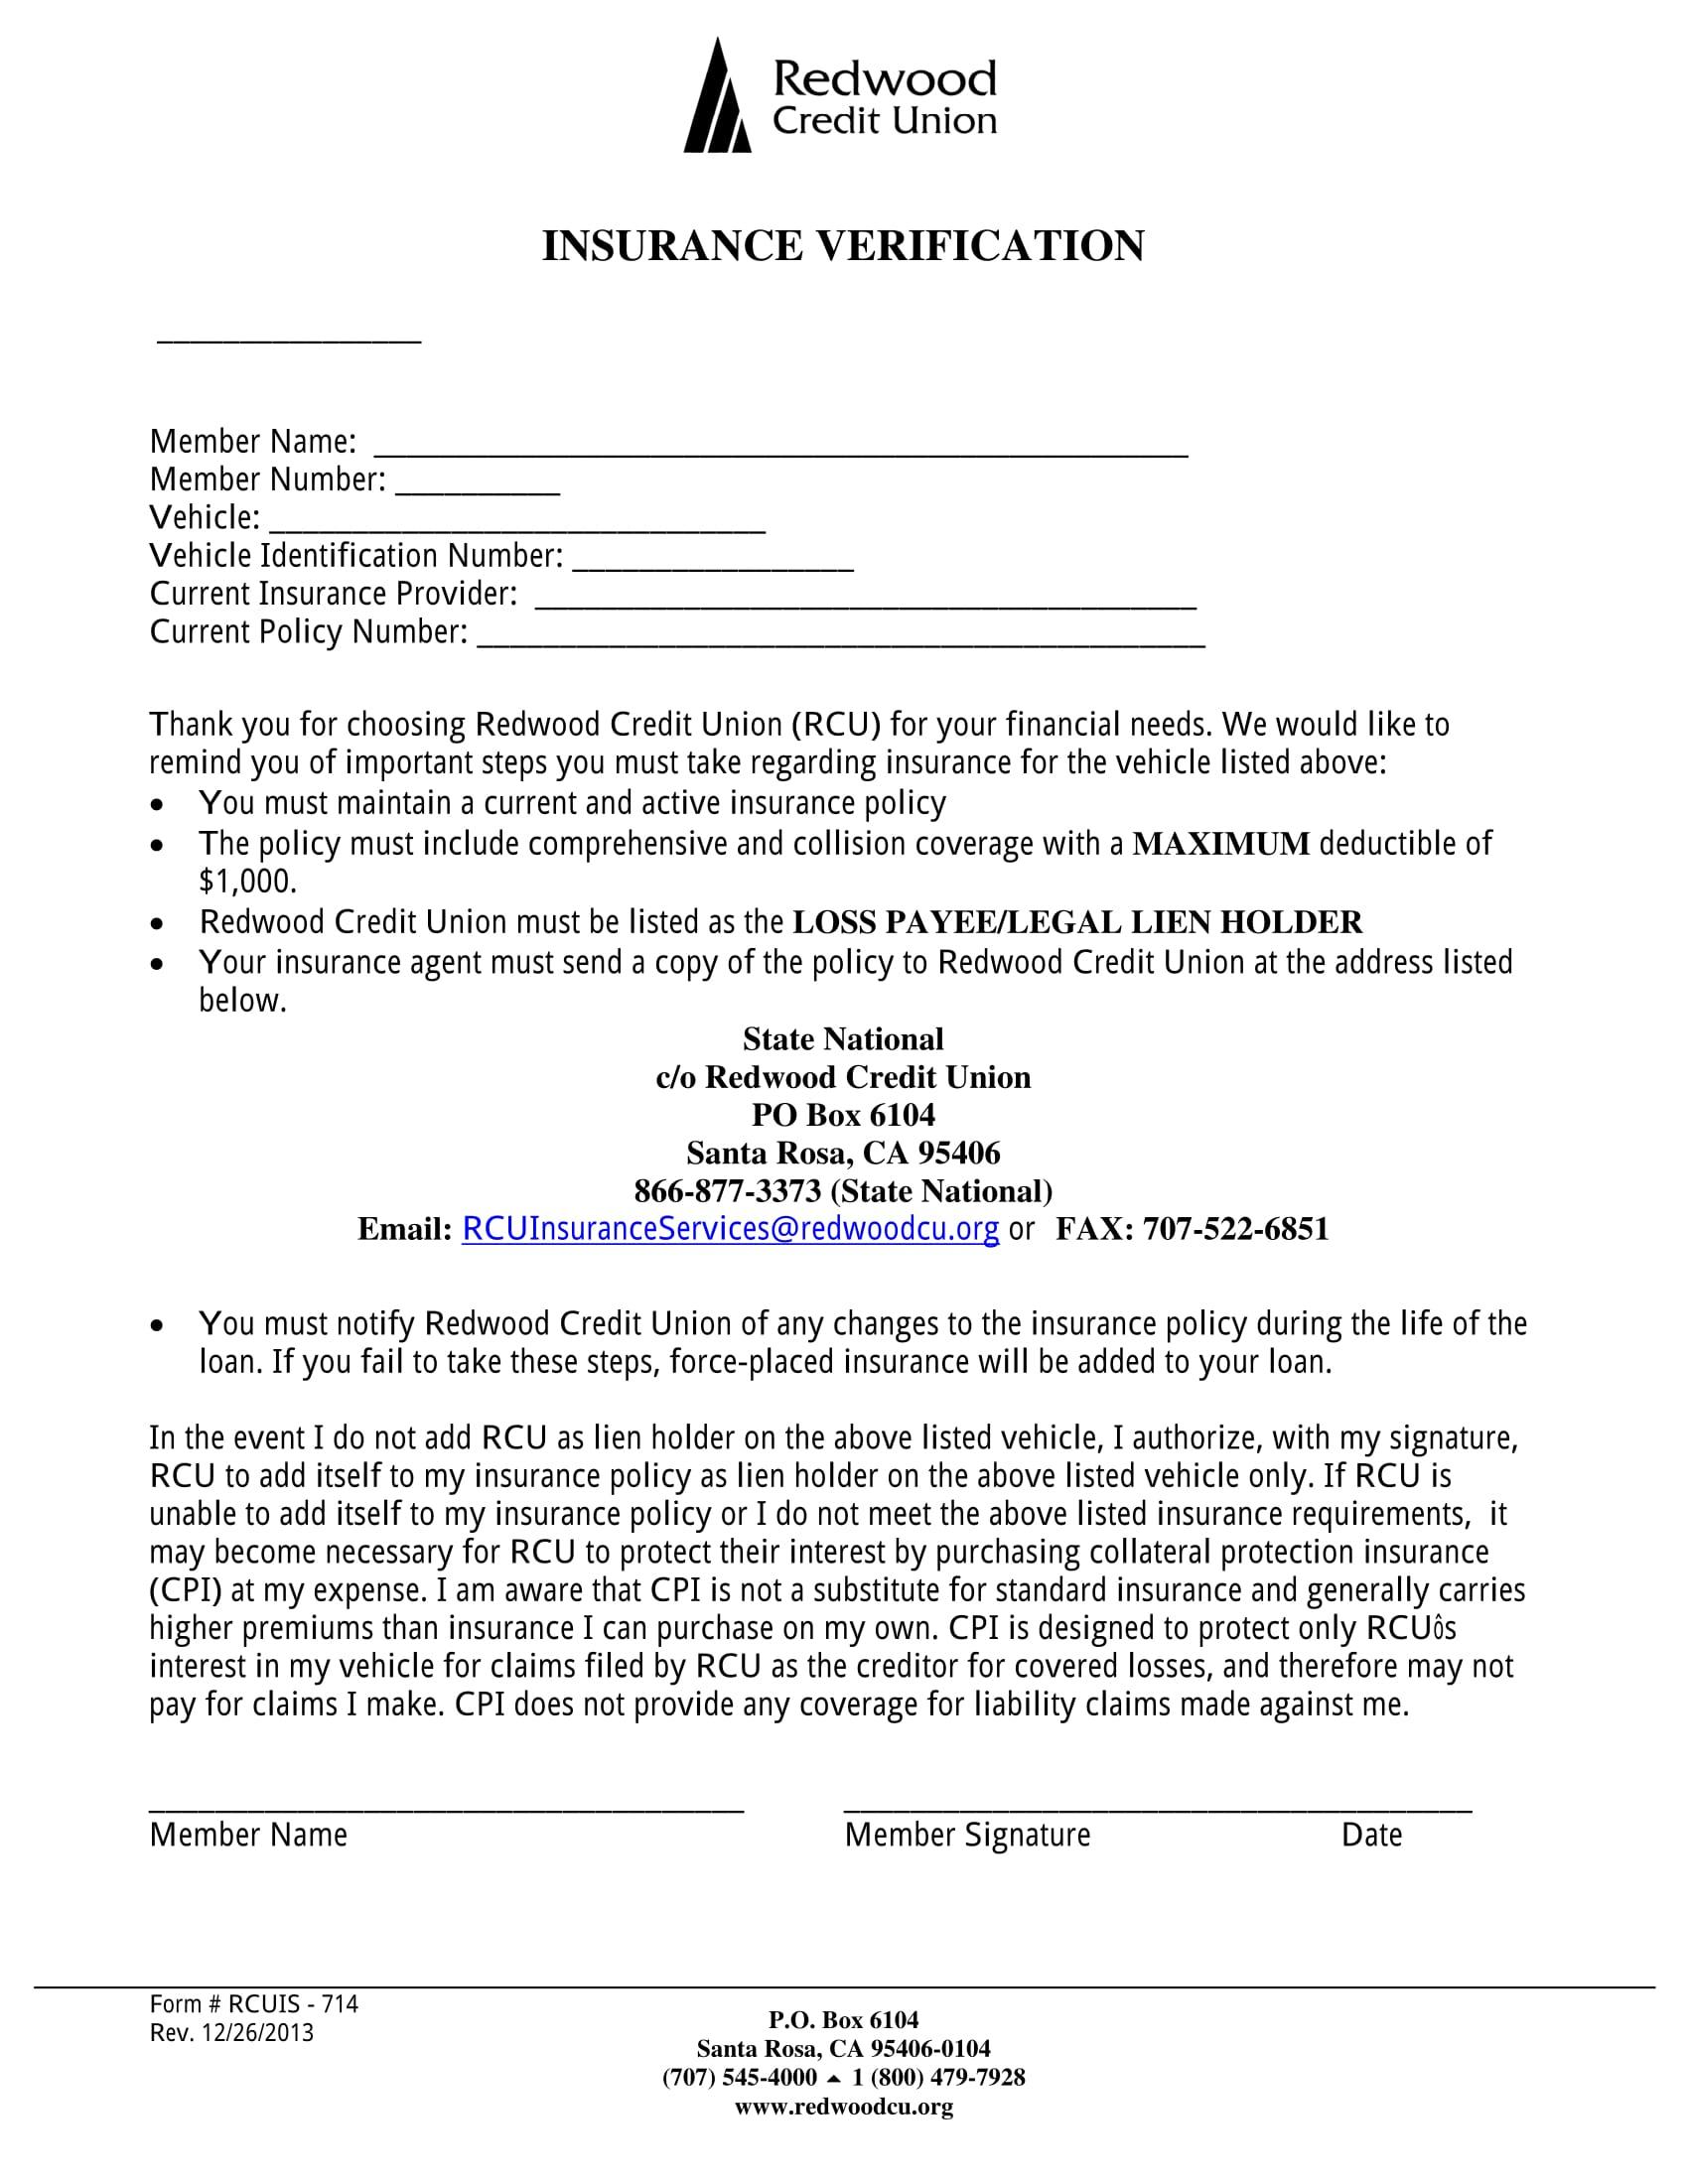 lien holder insurance verification form 1